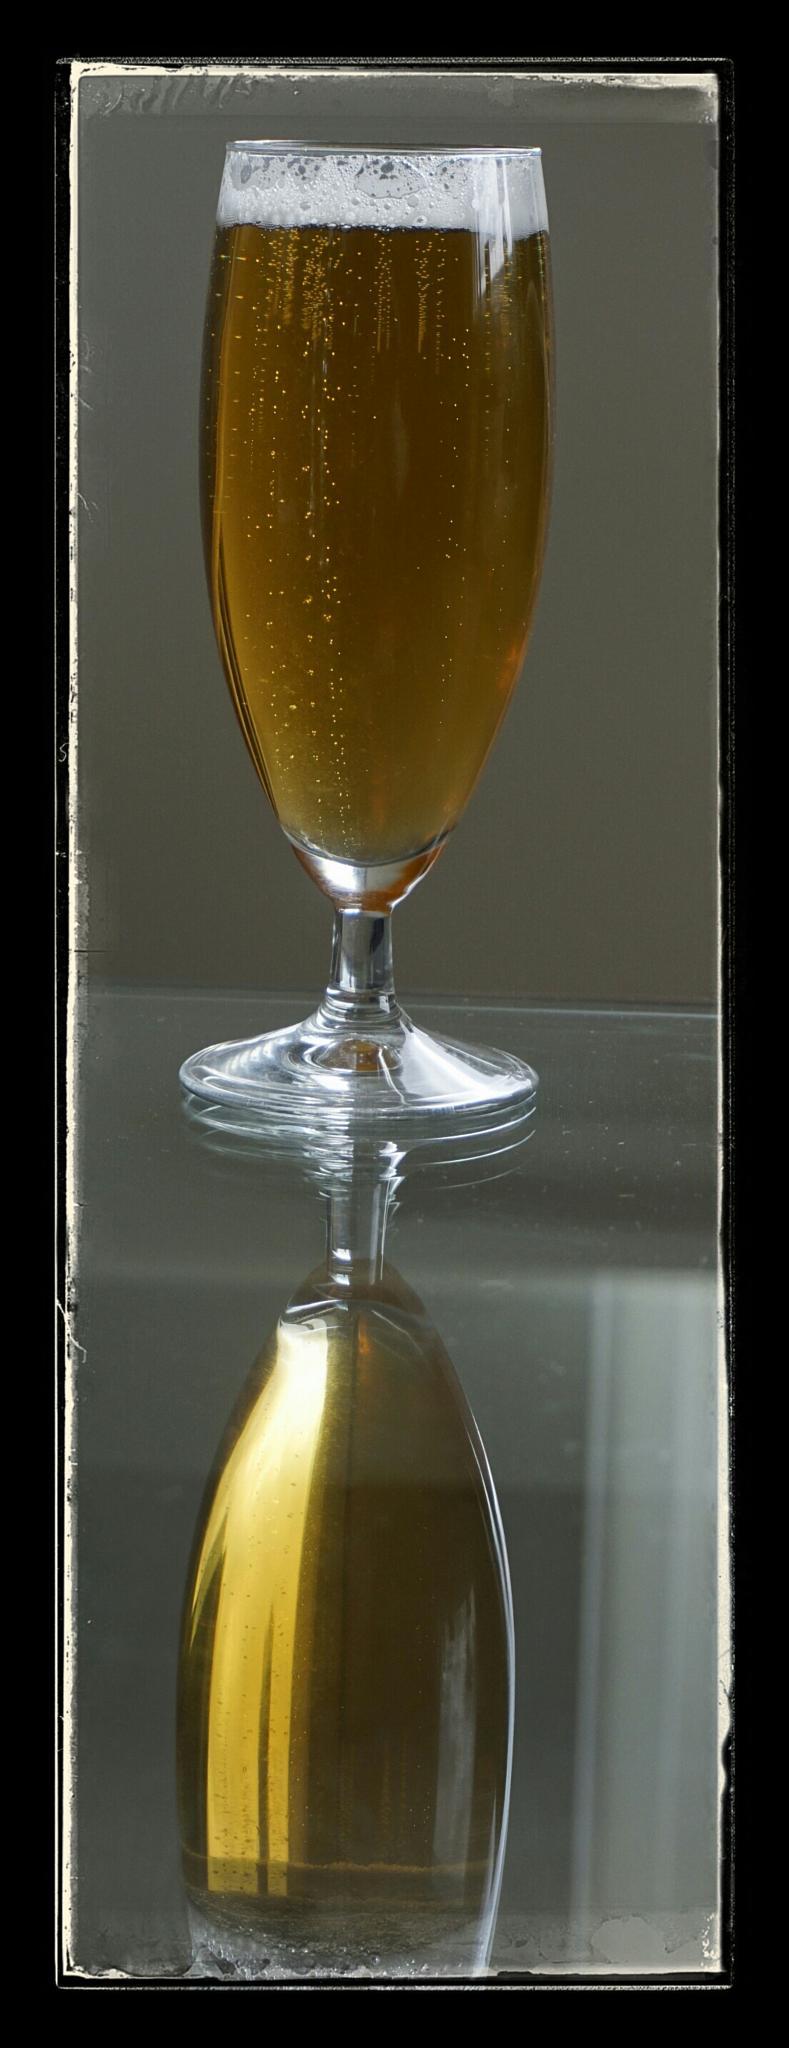 Beer by stig.stromberg